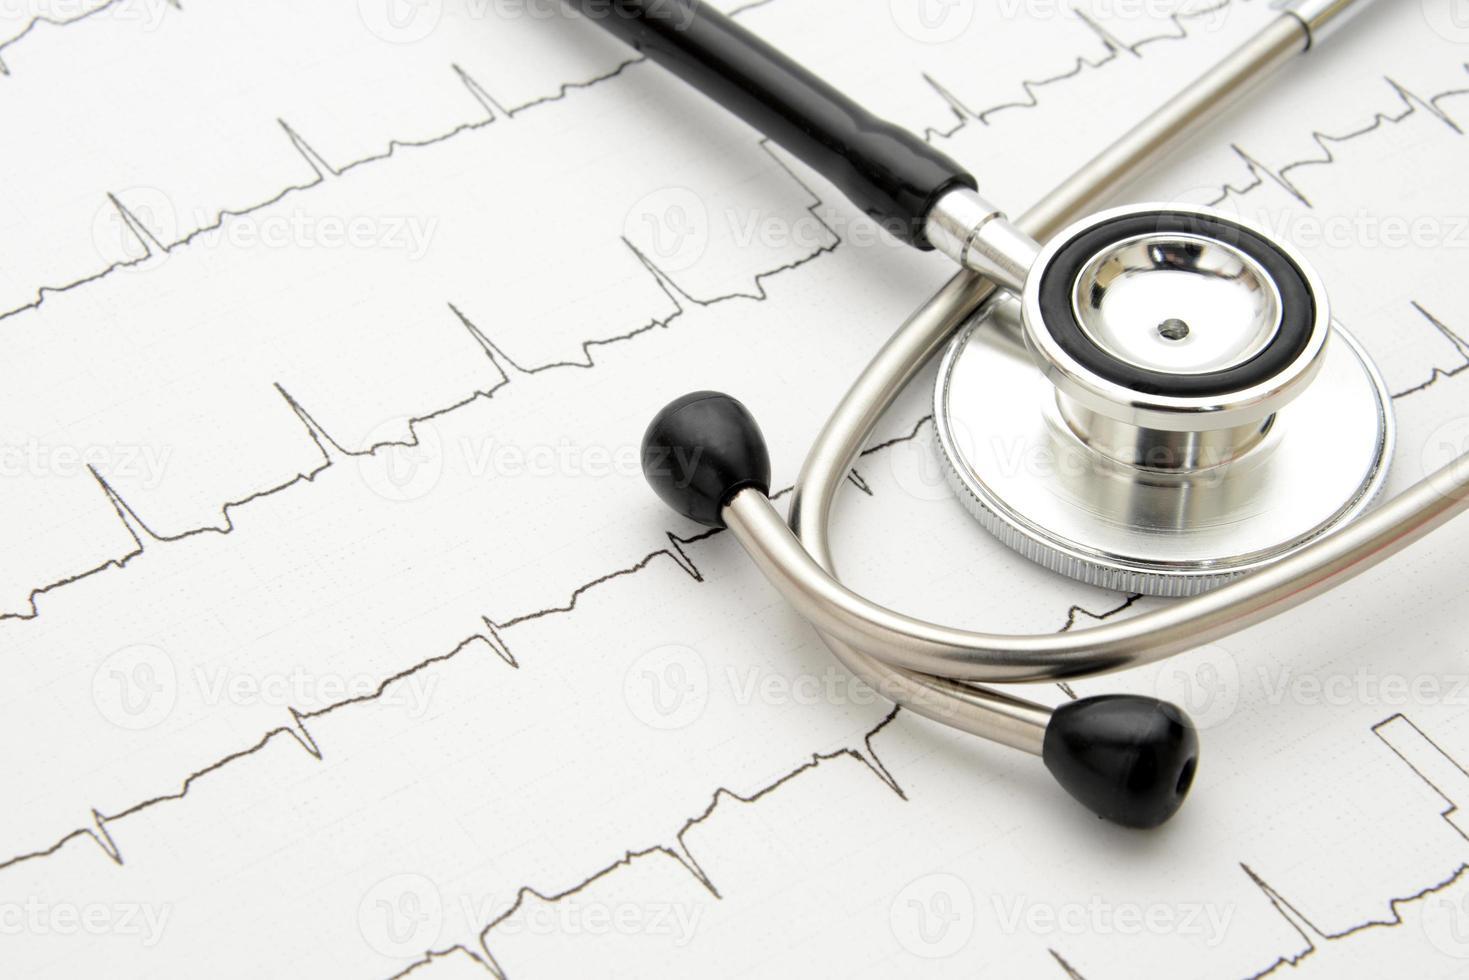 Stethoskop auf Elektrokardiogramm foto